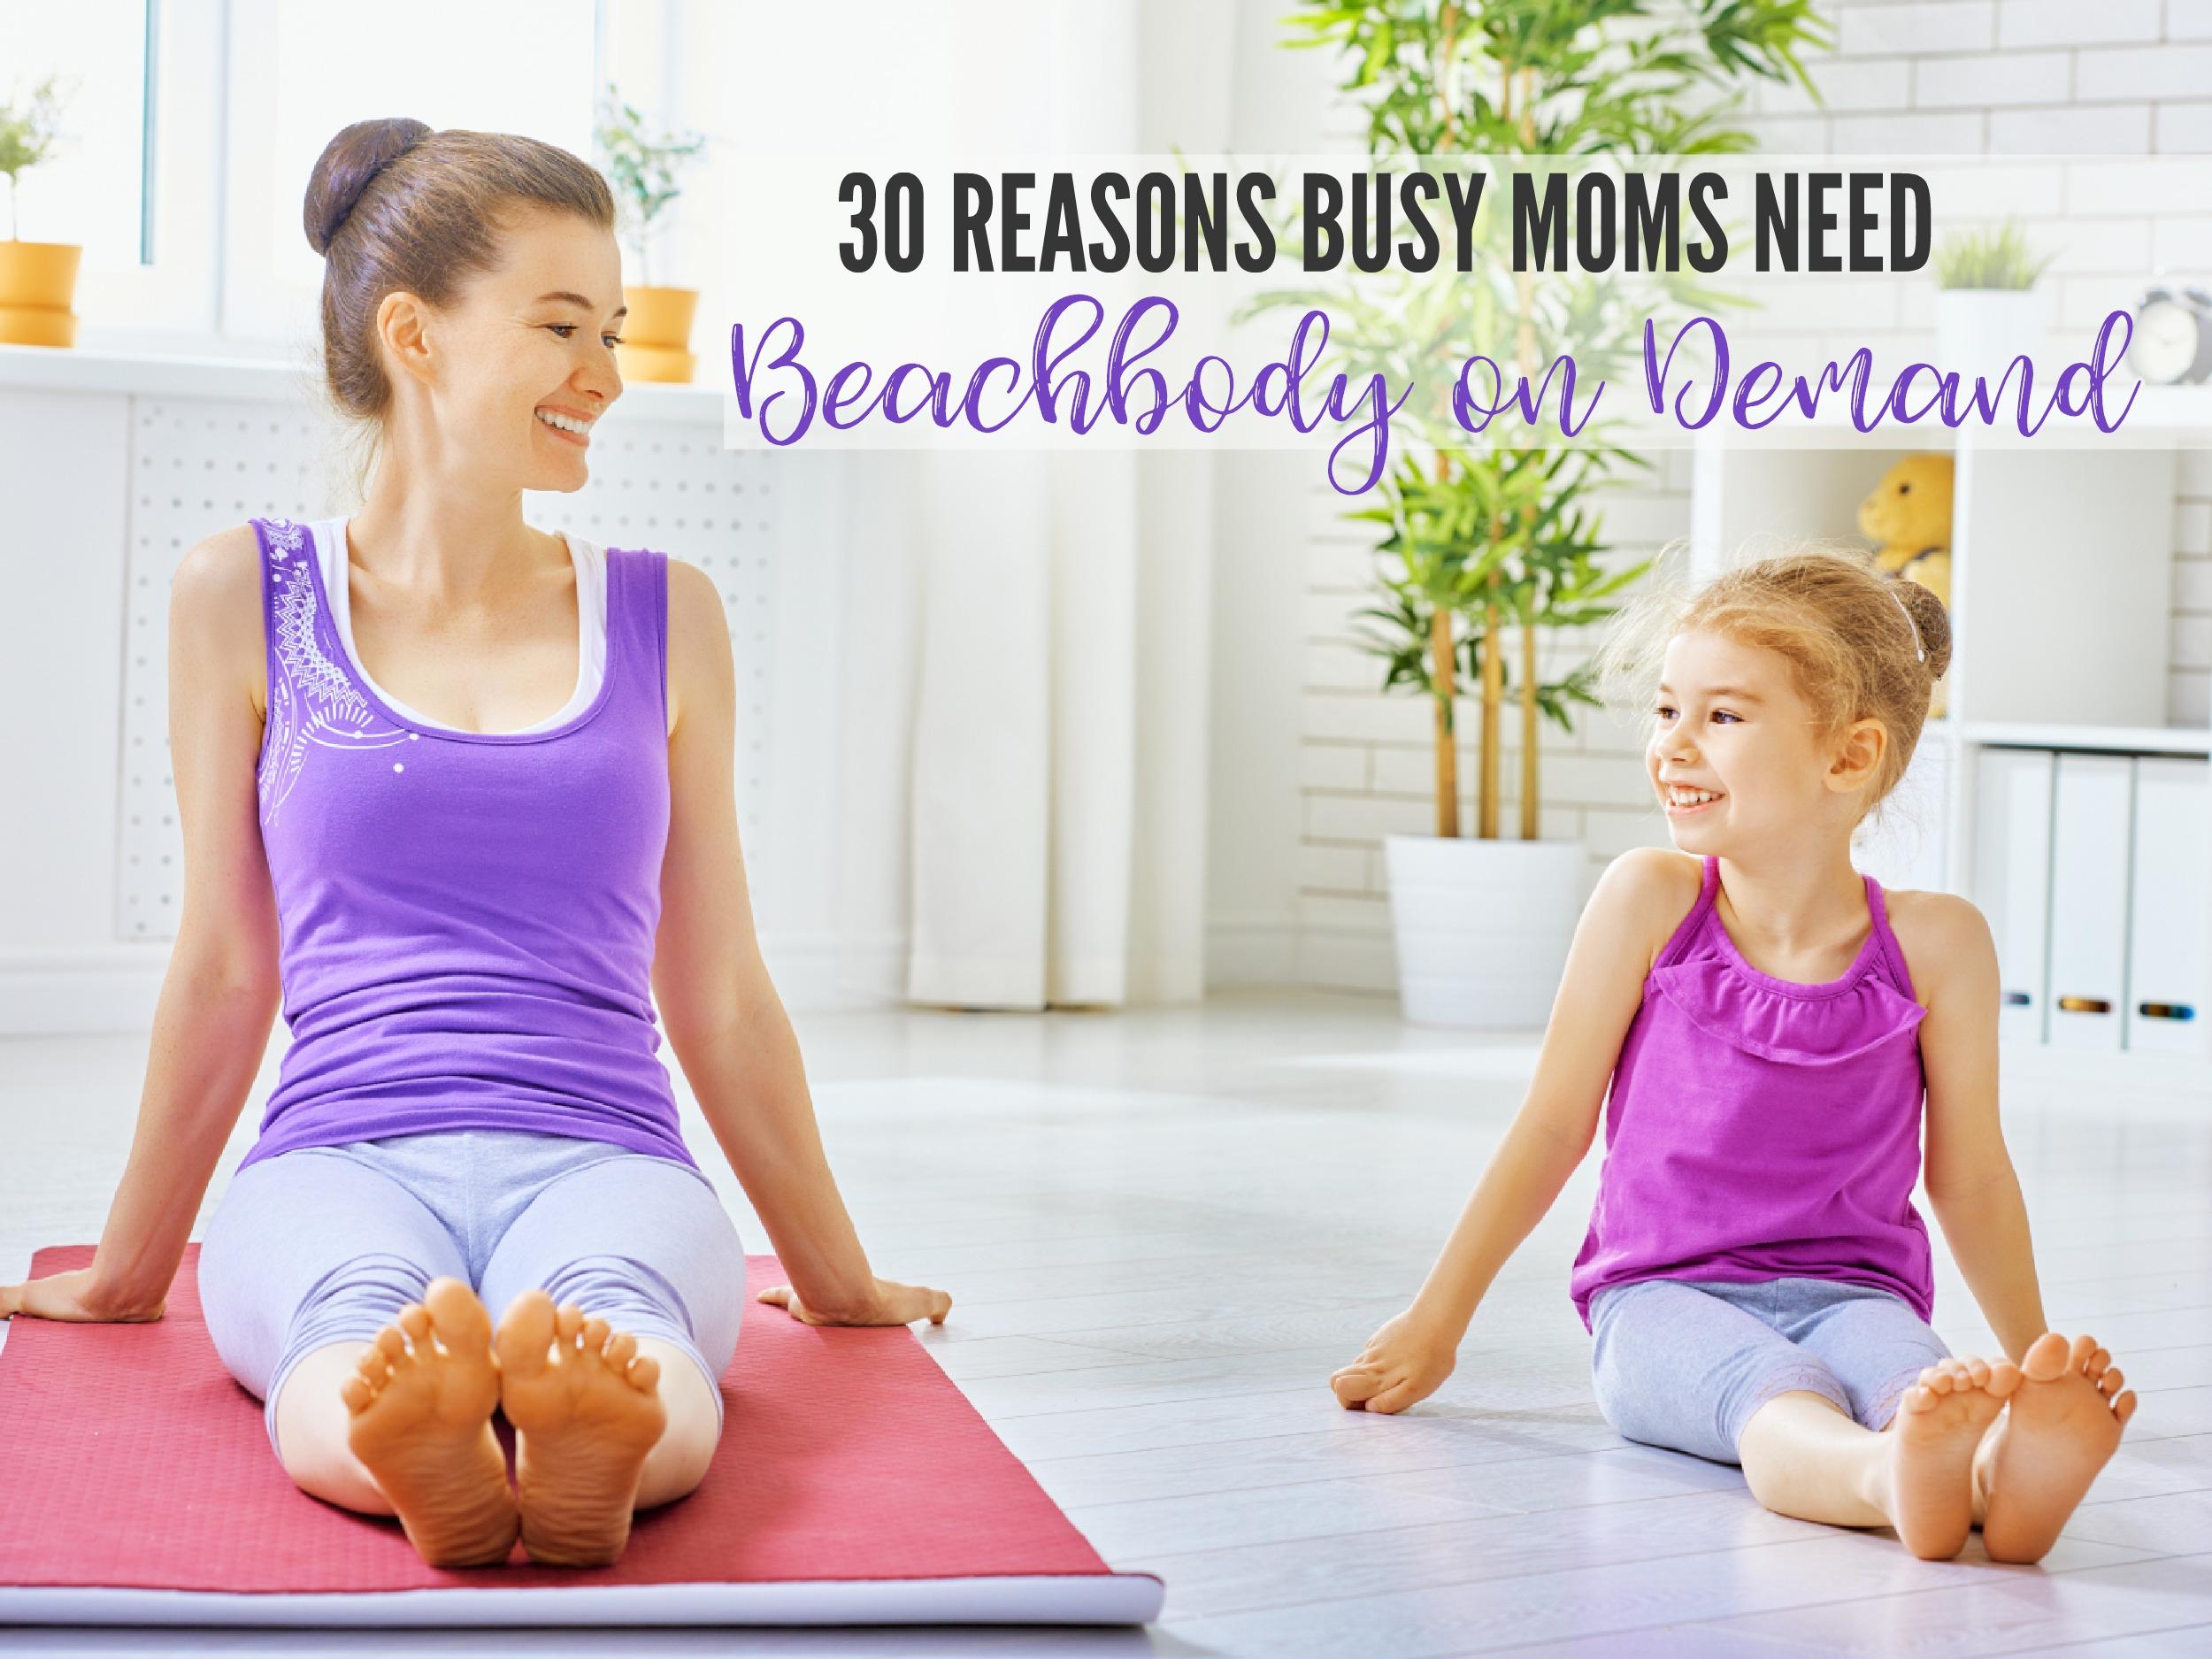 30-reasons-busy-moms-need-bod.jpg